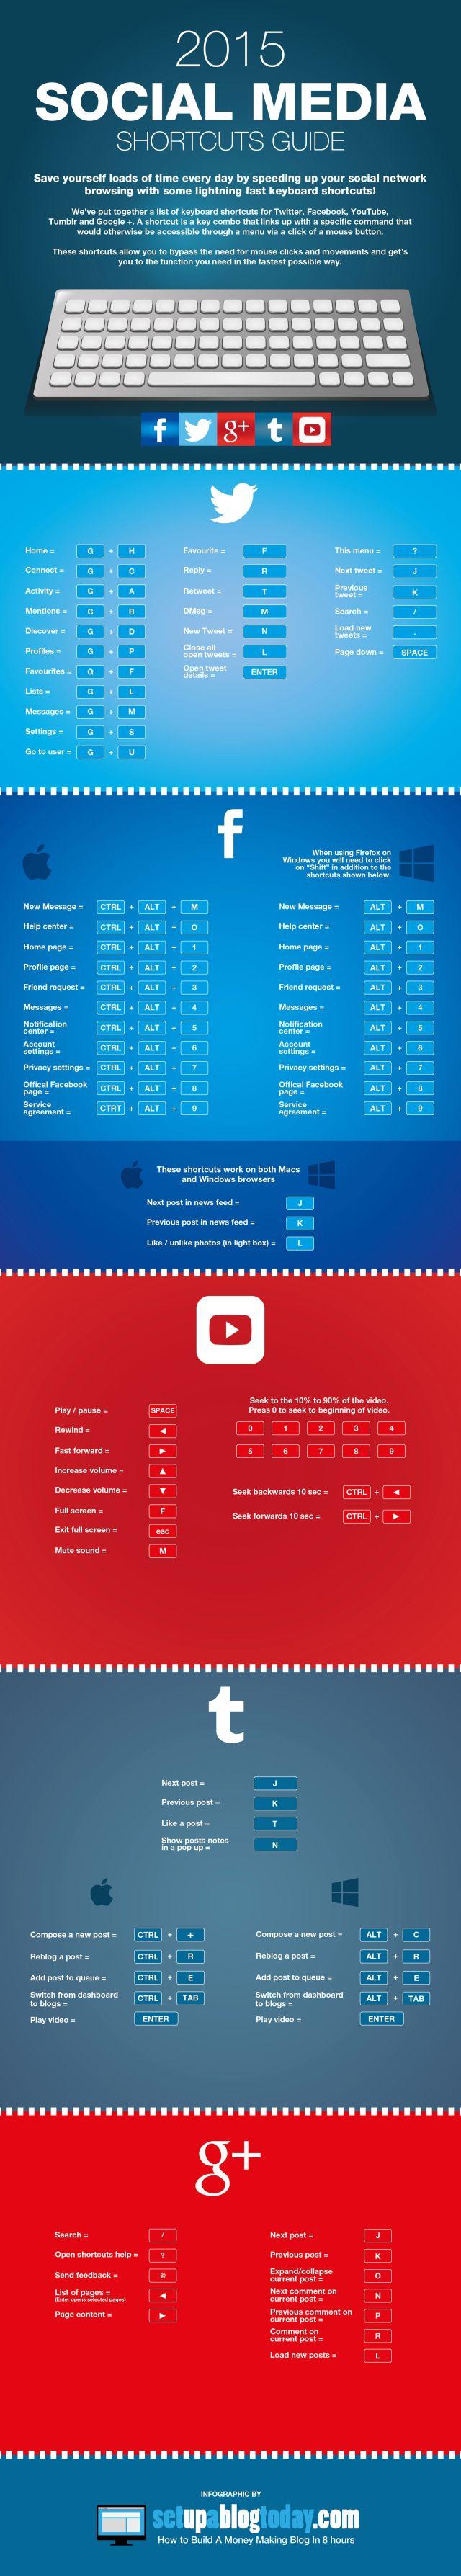 2015 Social Media Keyboard Shortcuts Cheat Sheet #infographic